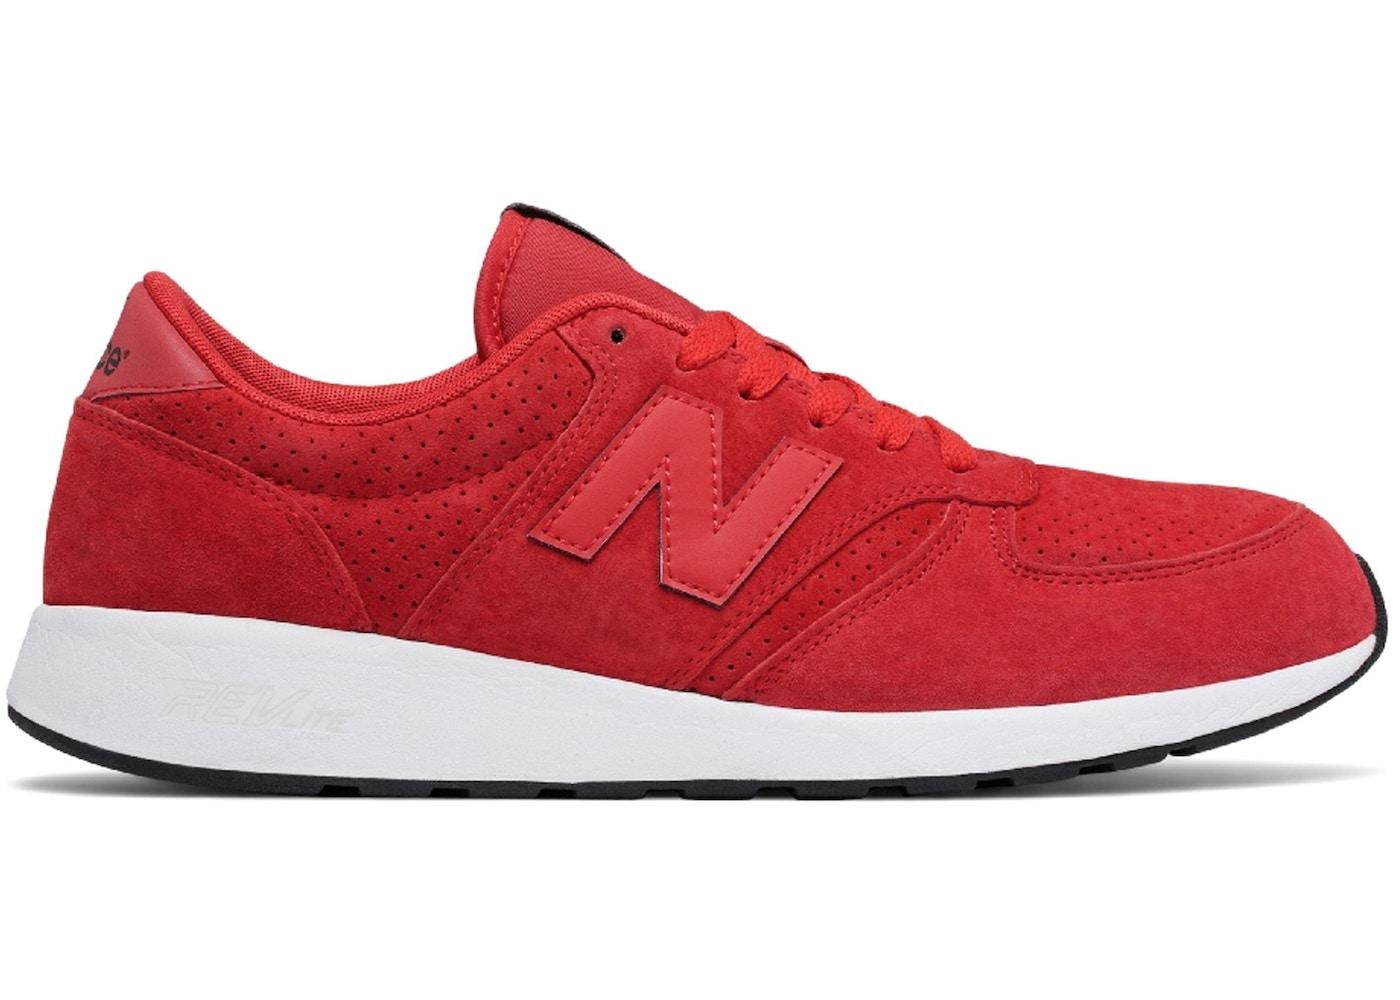 New Balance 420 Re-Engineered Red